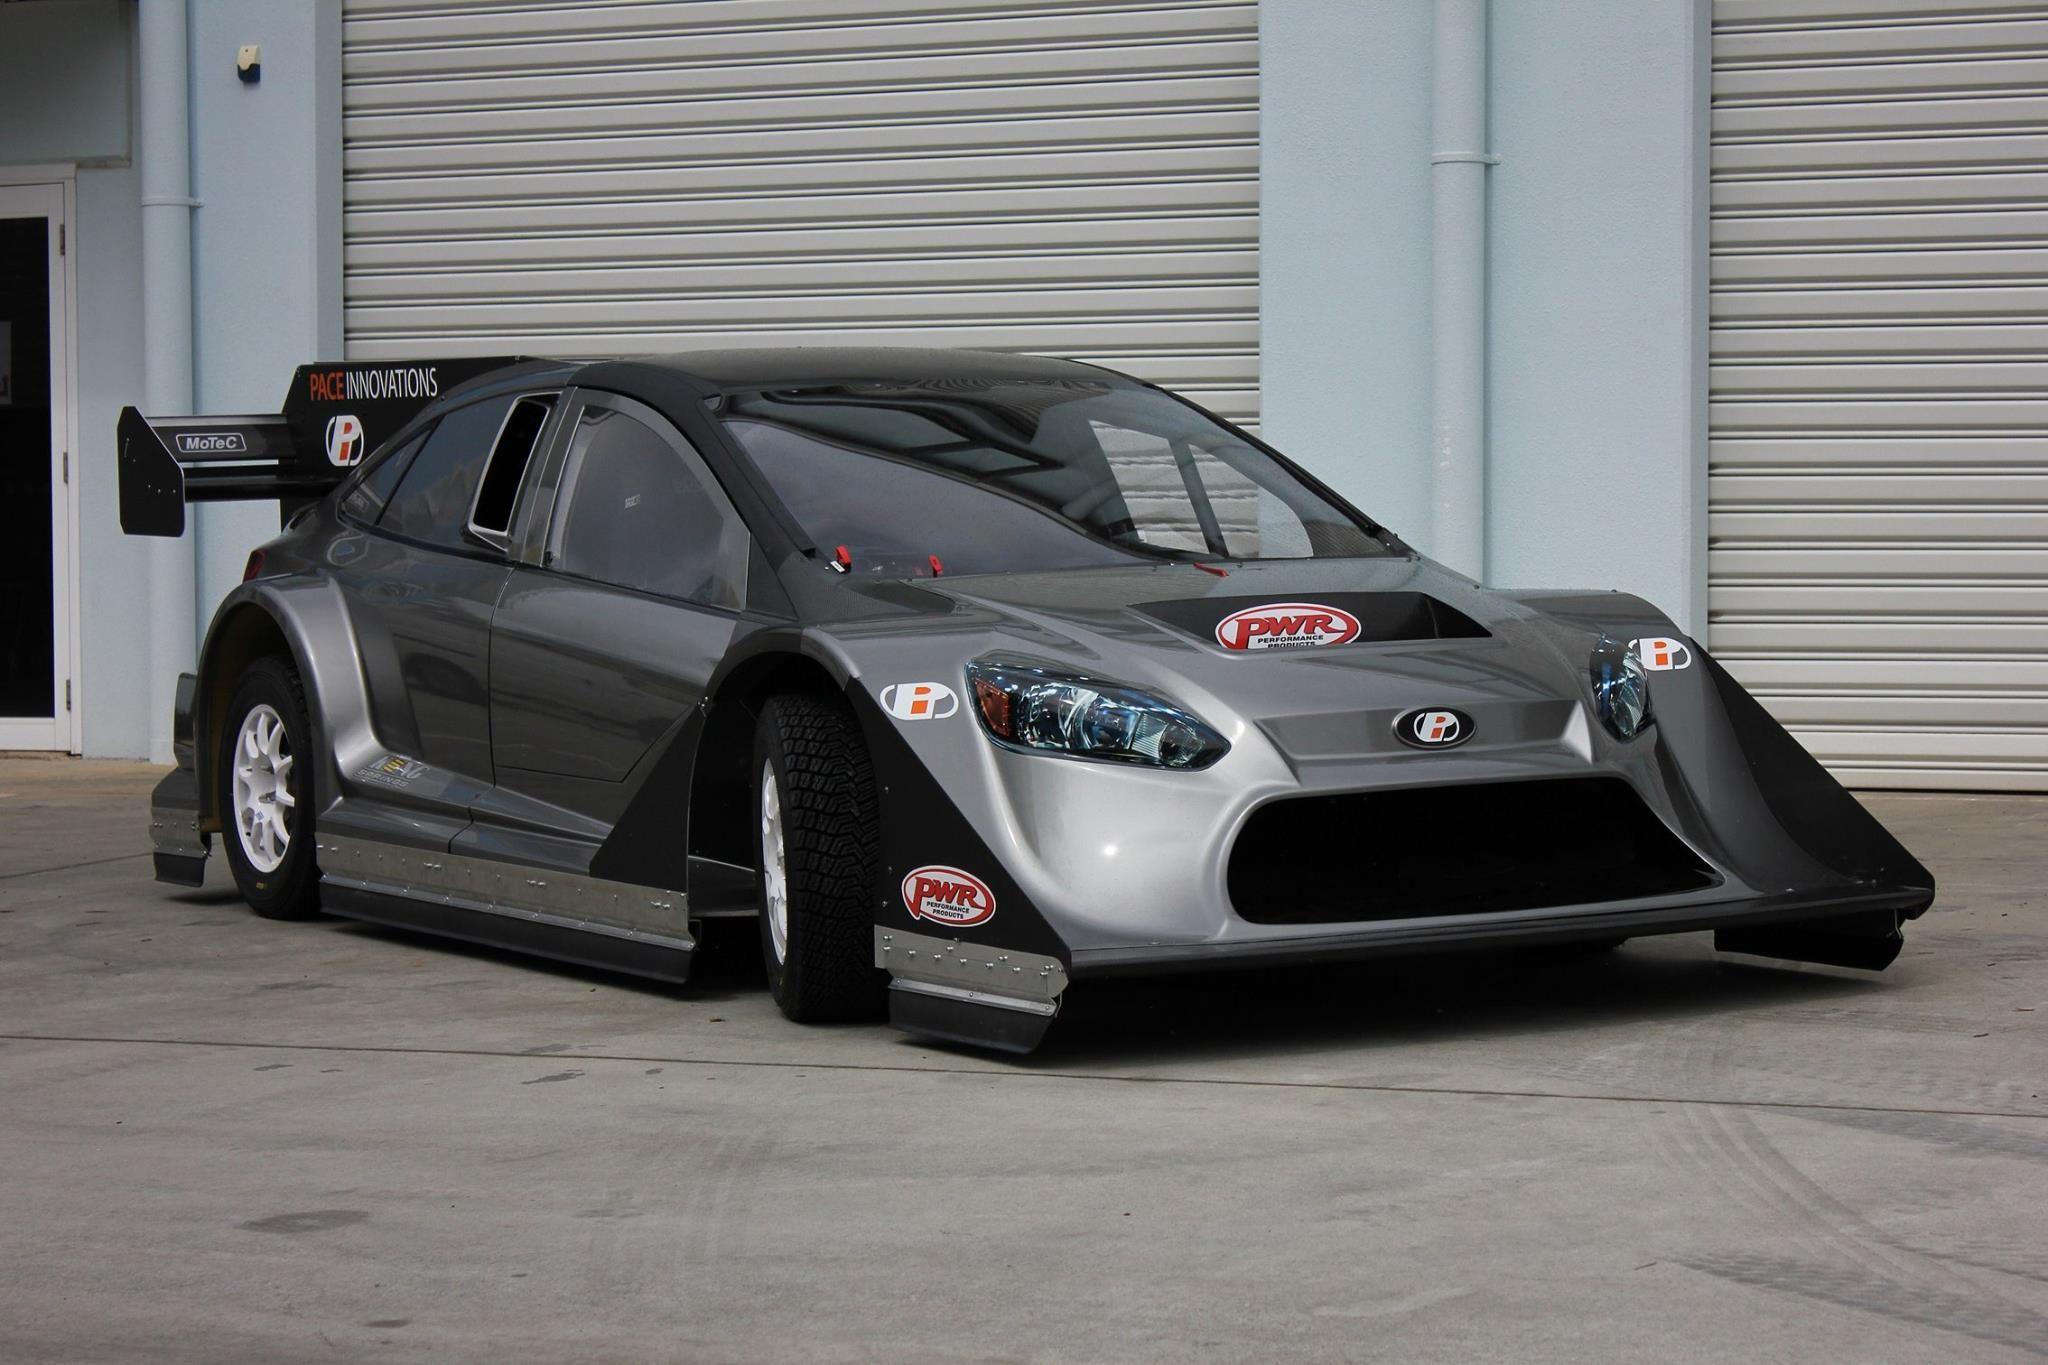 This Nissan Gt R Powered Ford Focus Hillclimb Car Is A 4wd Speed Machine 2014 Frame